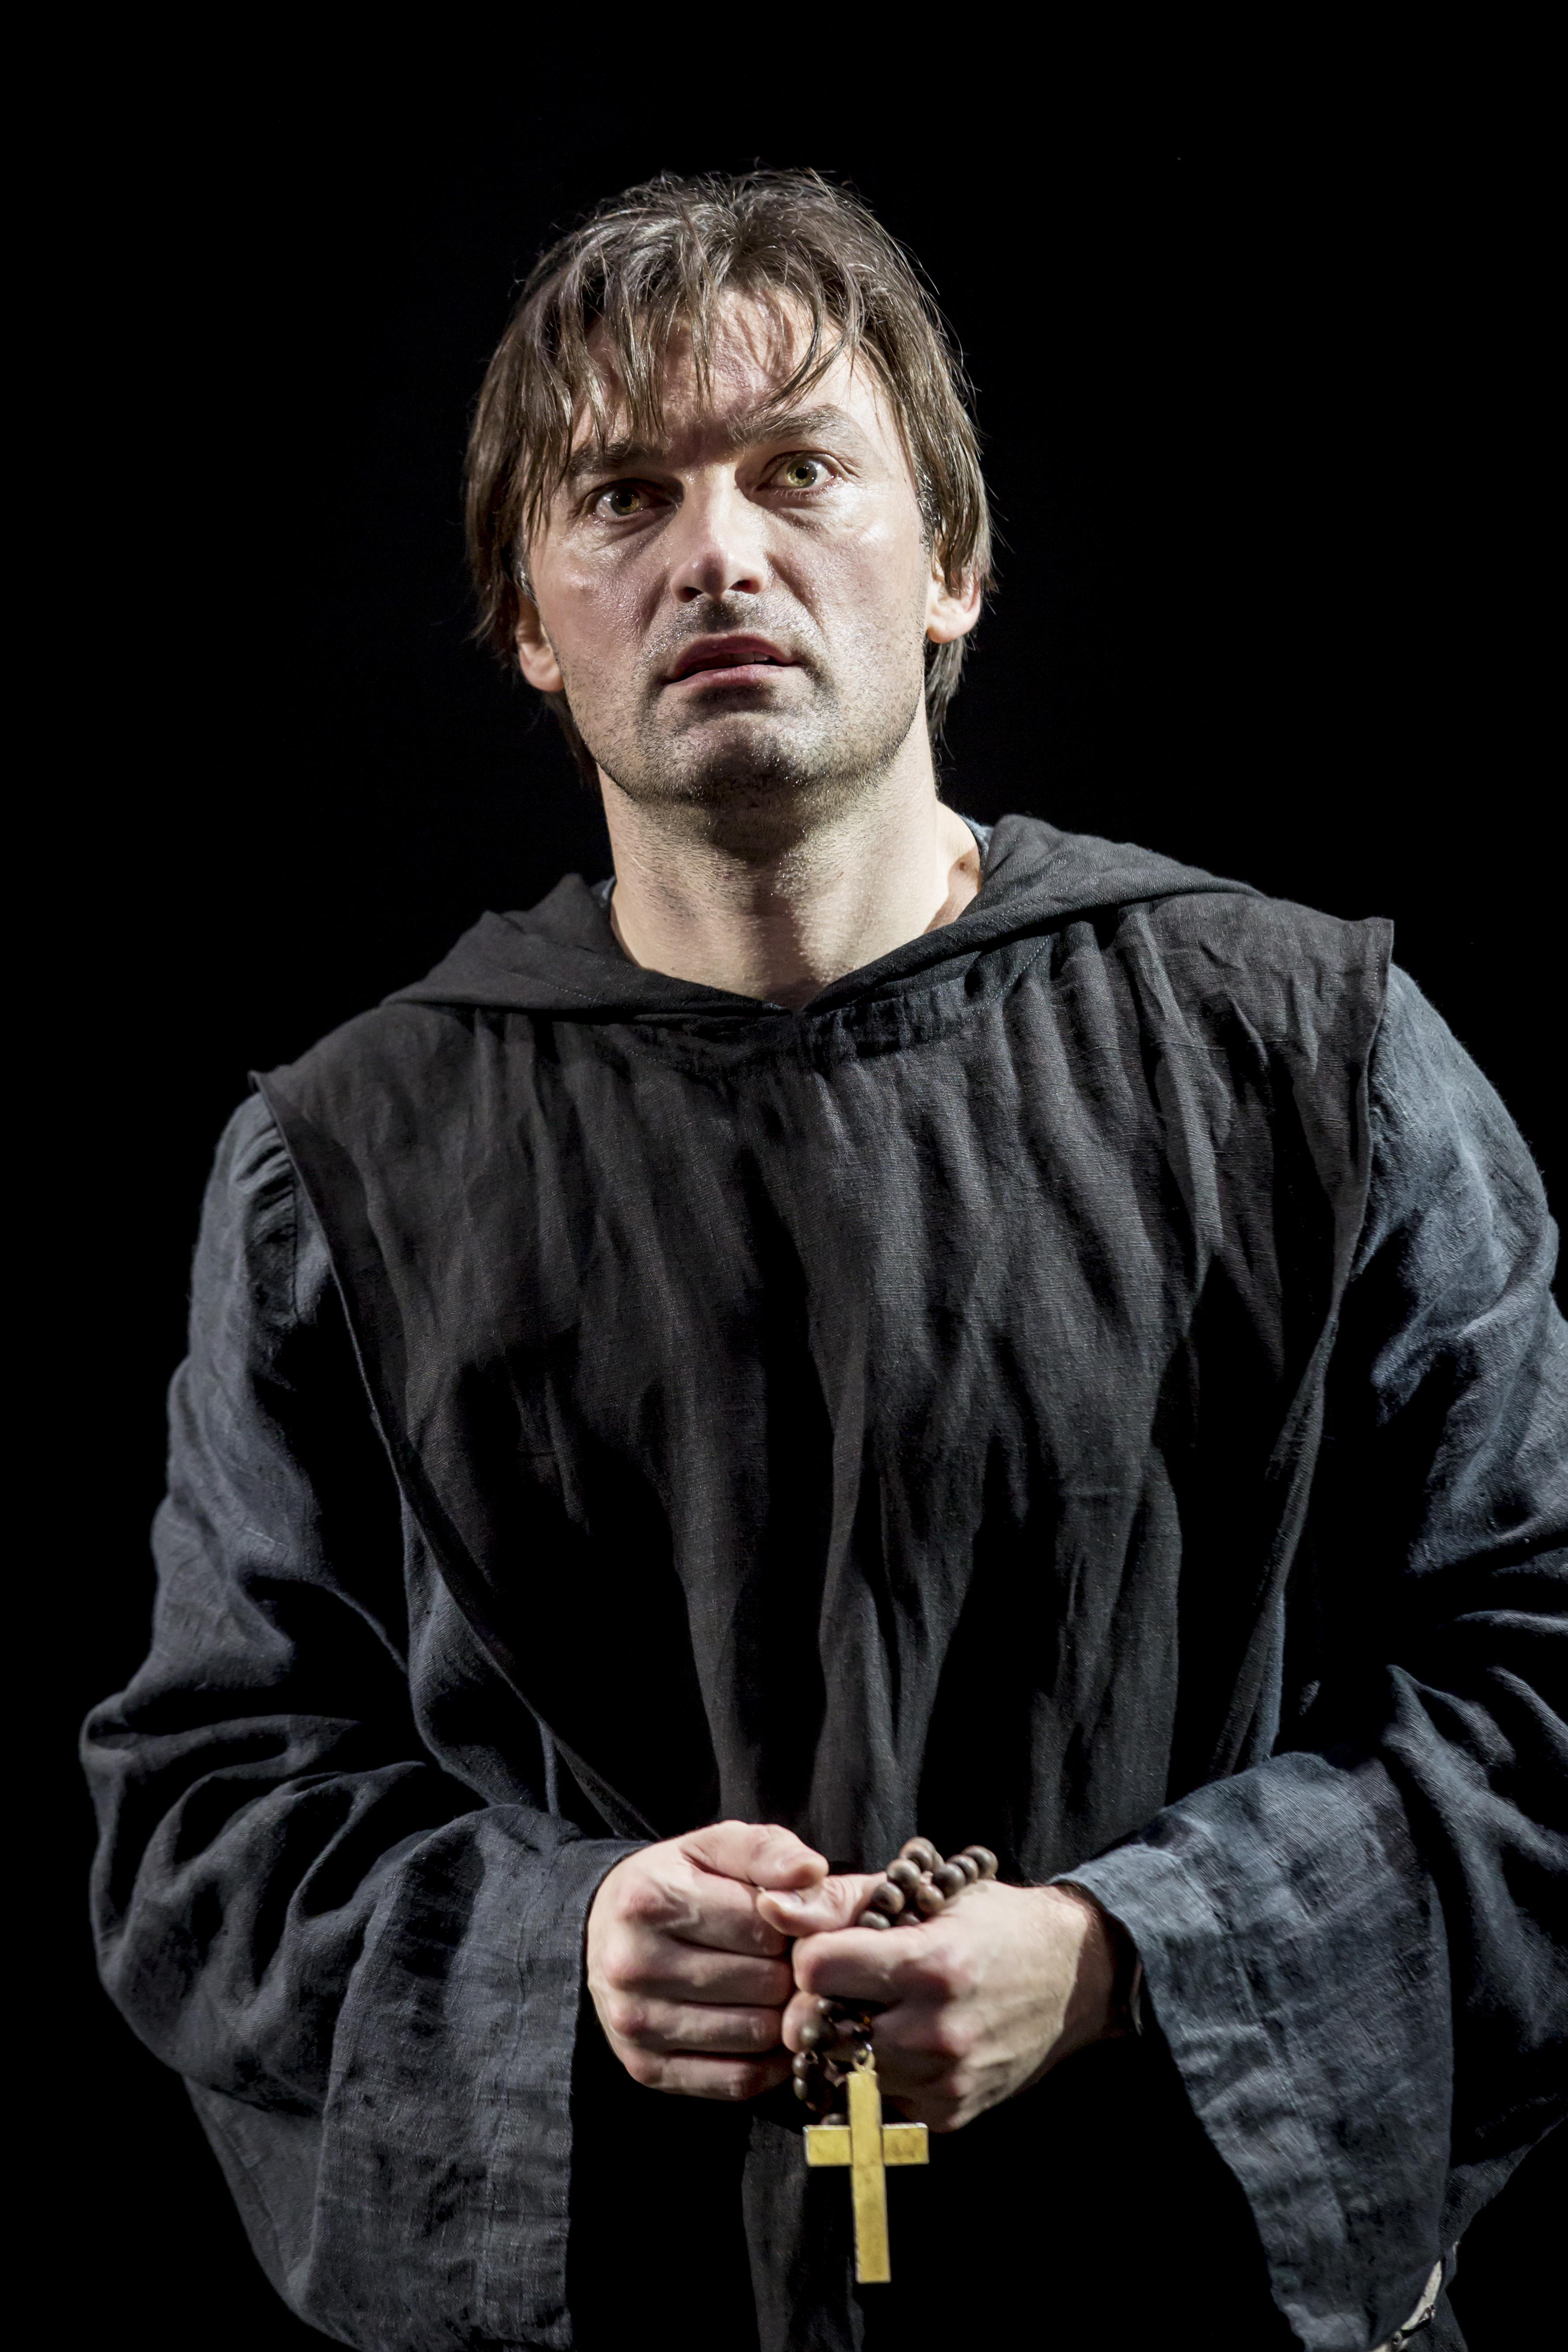 Alexander Arsentyev